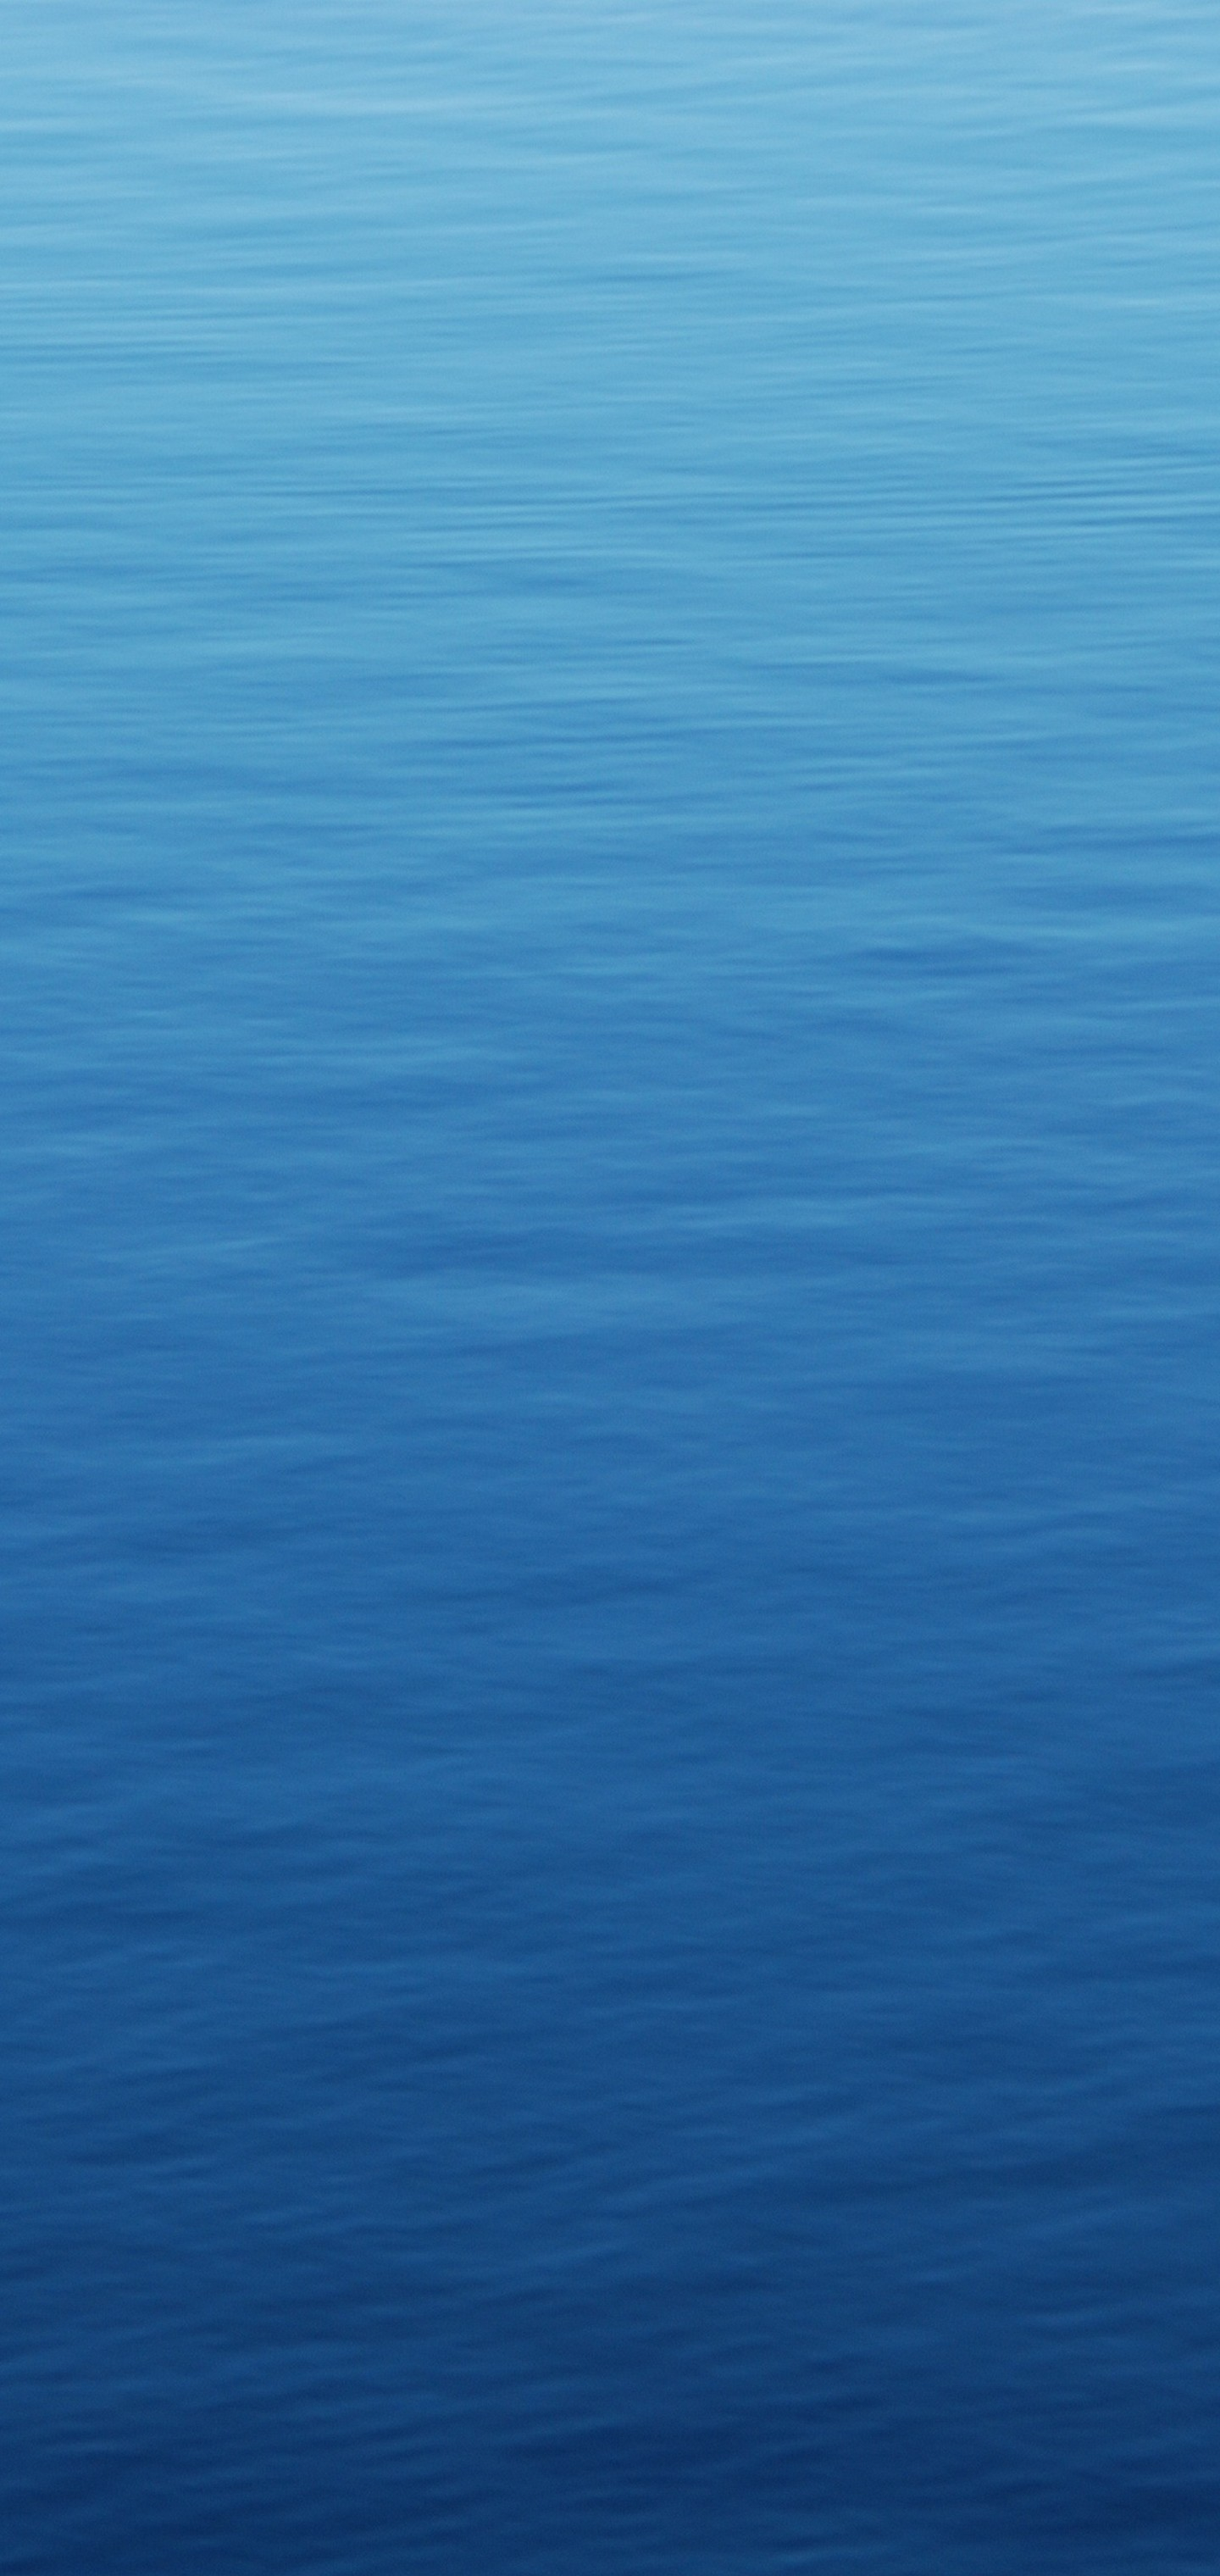 Sea Ocean Water Wallpaper 1440x3040